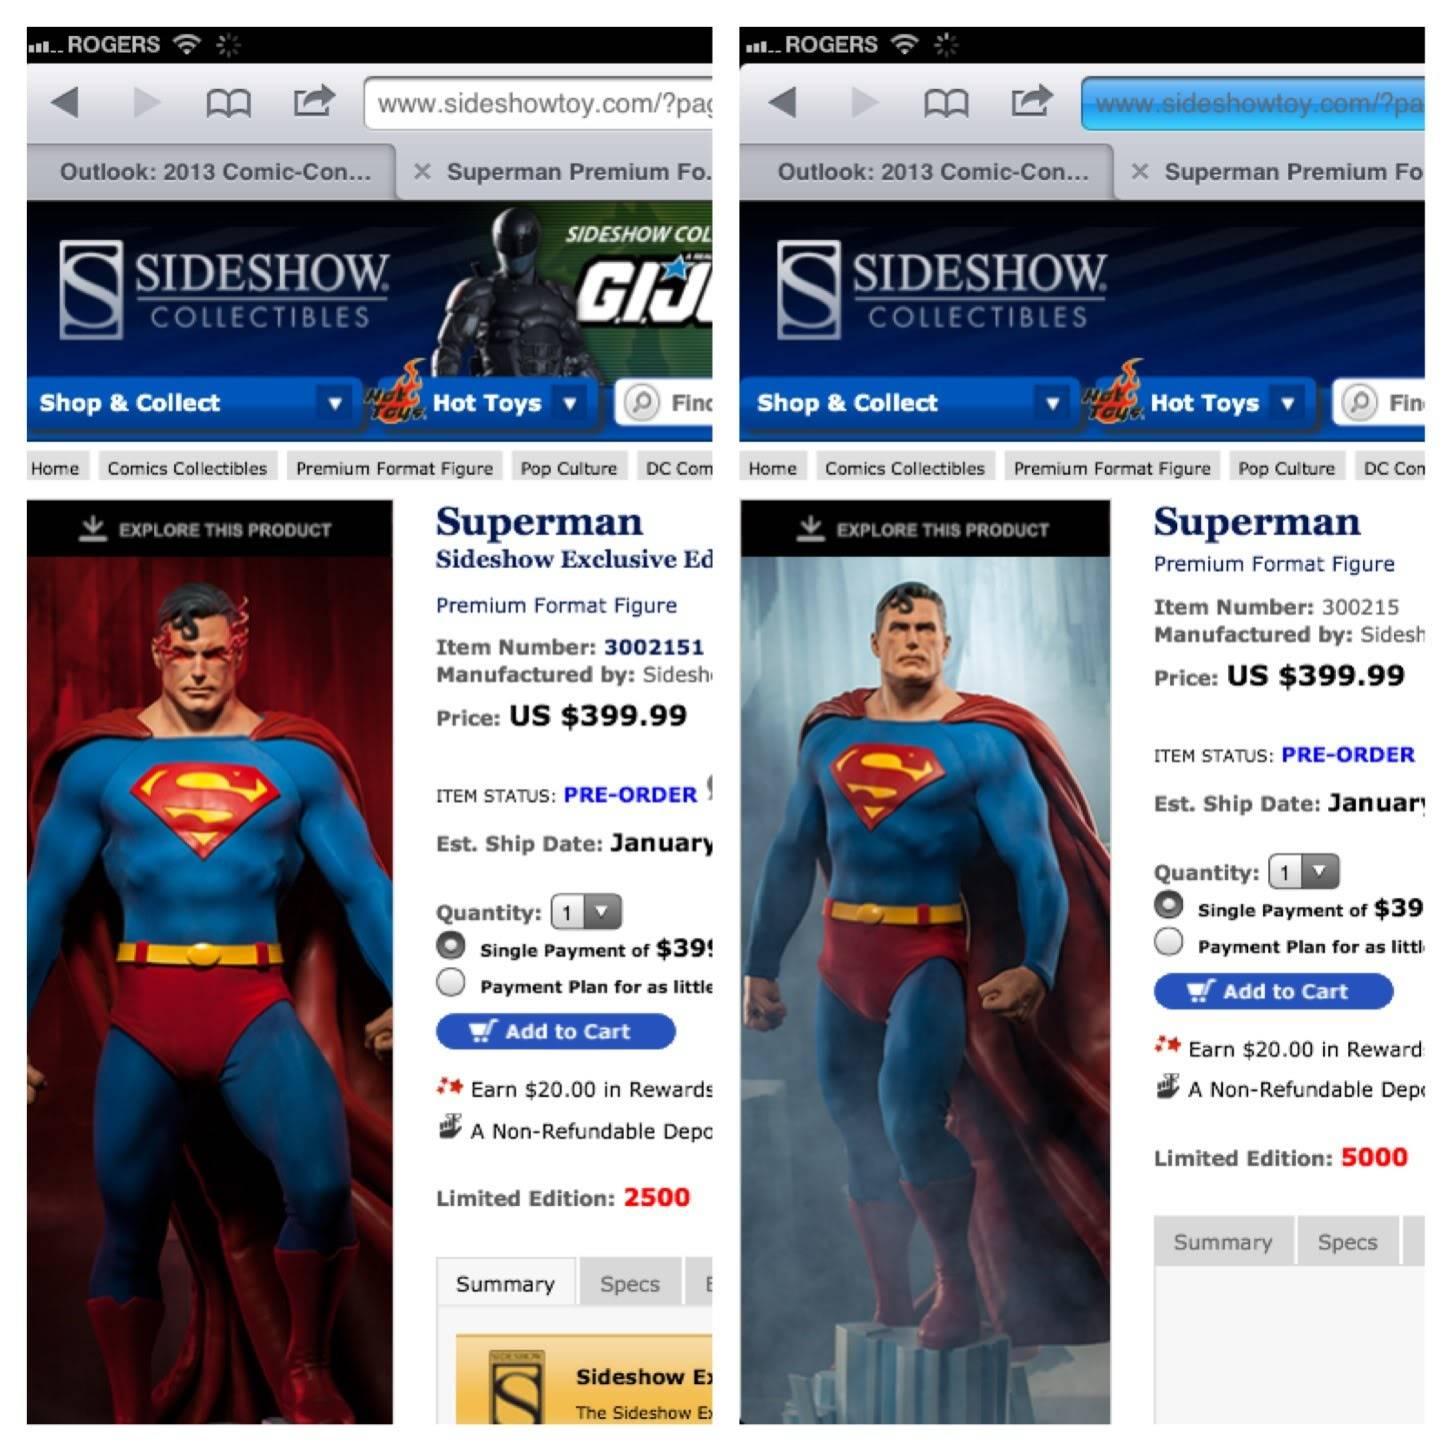 [Sideshow] Superman - Premium Format Figure - LANÇADO!!!! - Página 23 Null_zps6cd6185a